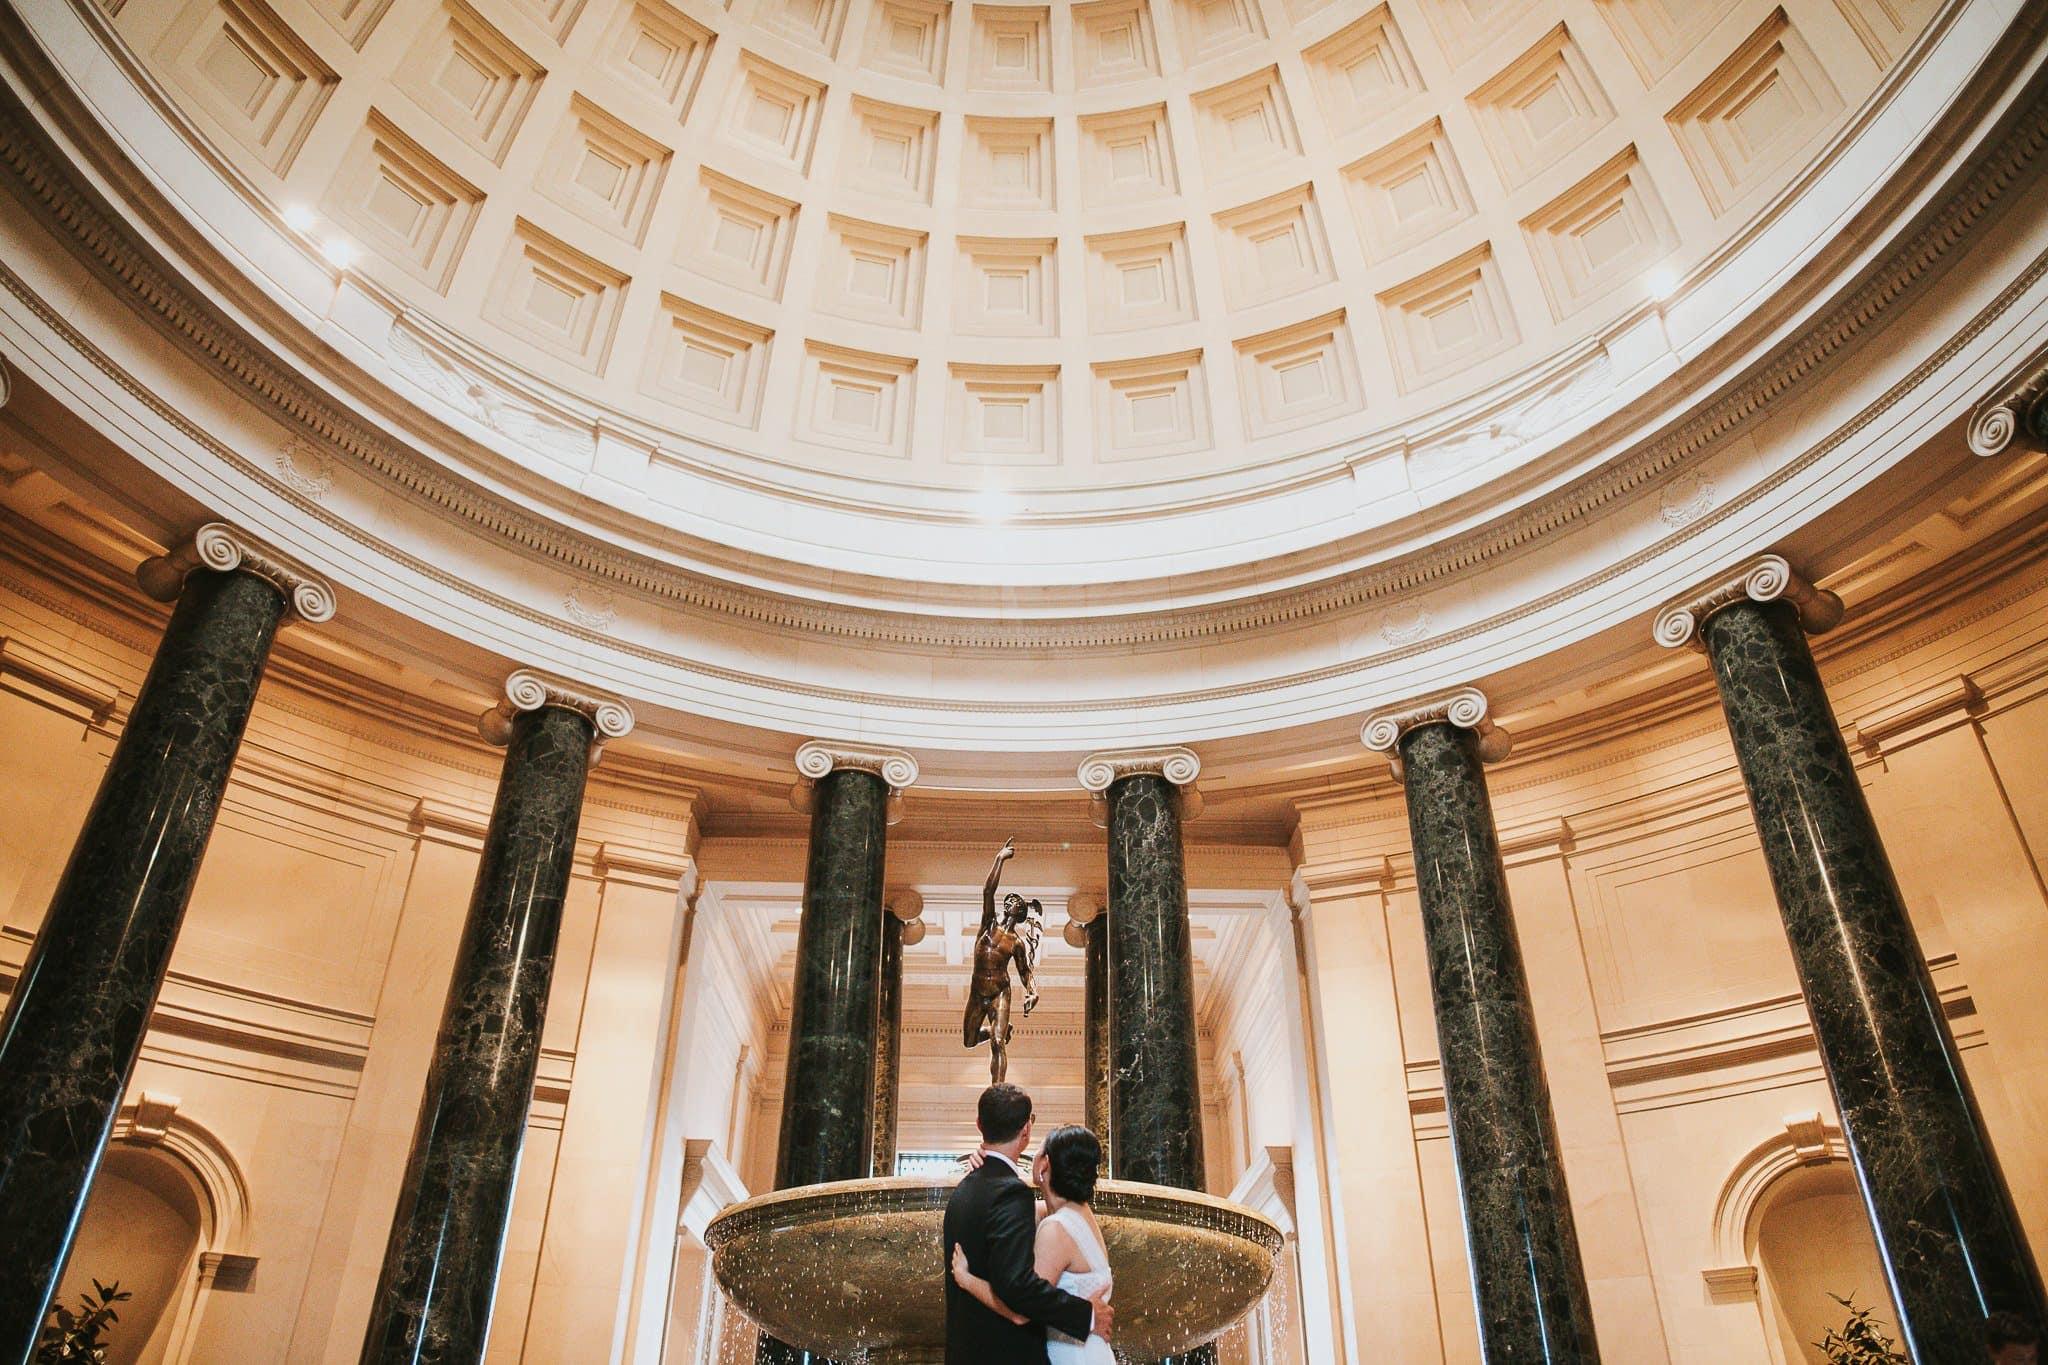 national gallery of art foyer